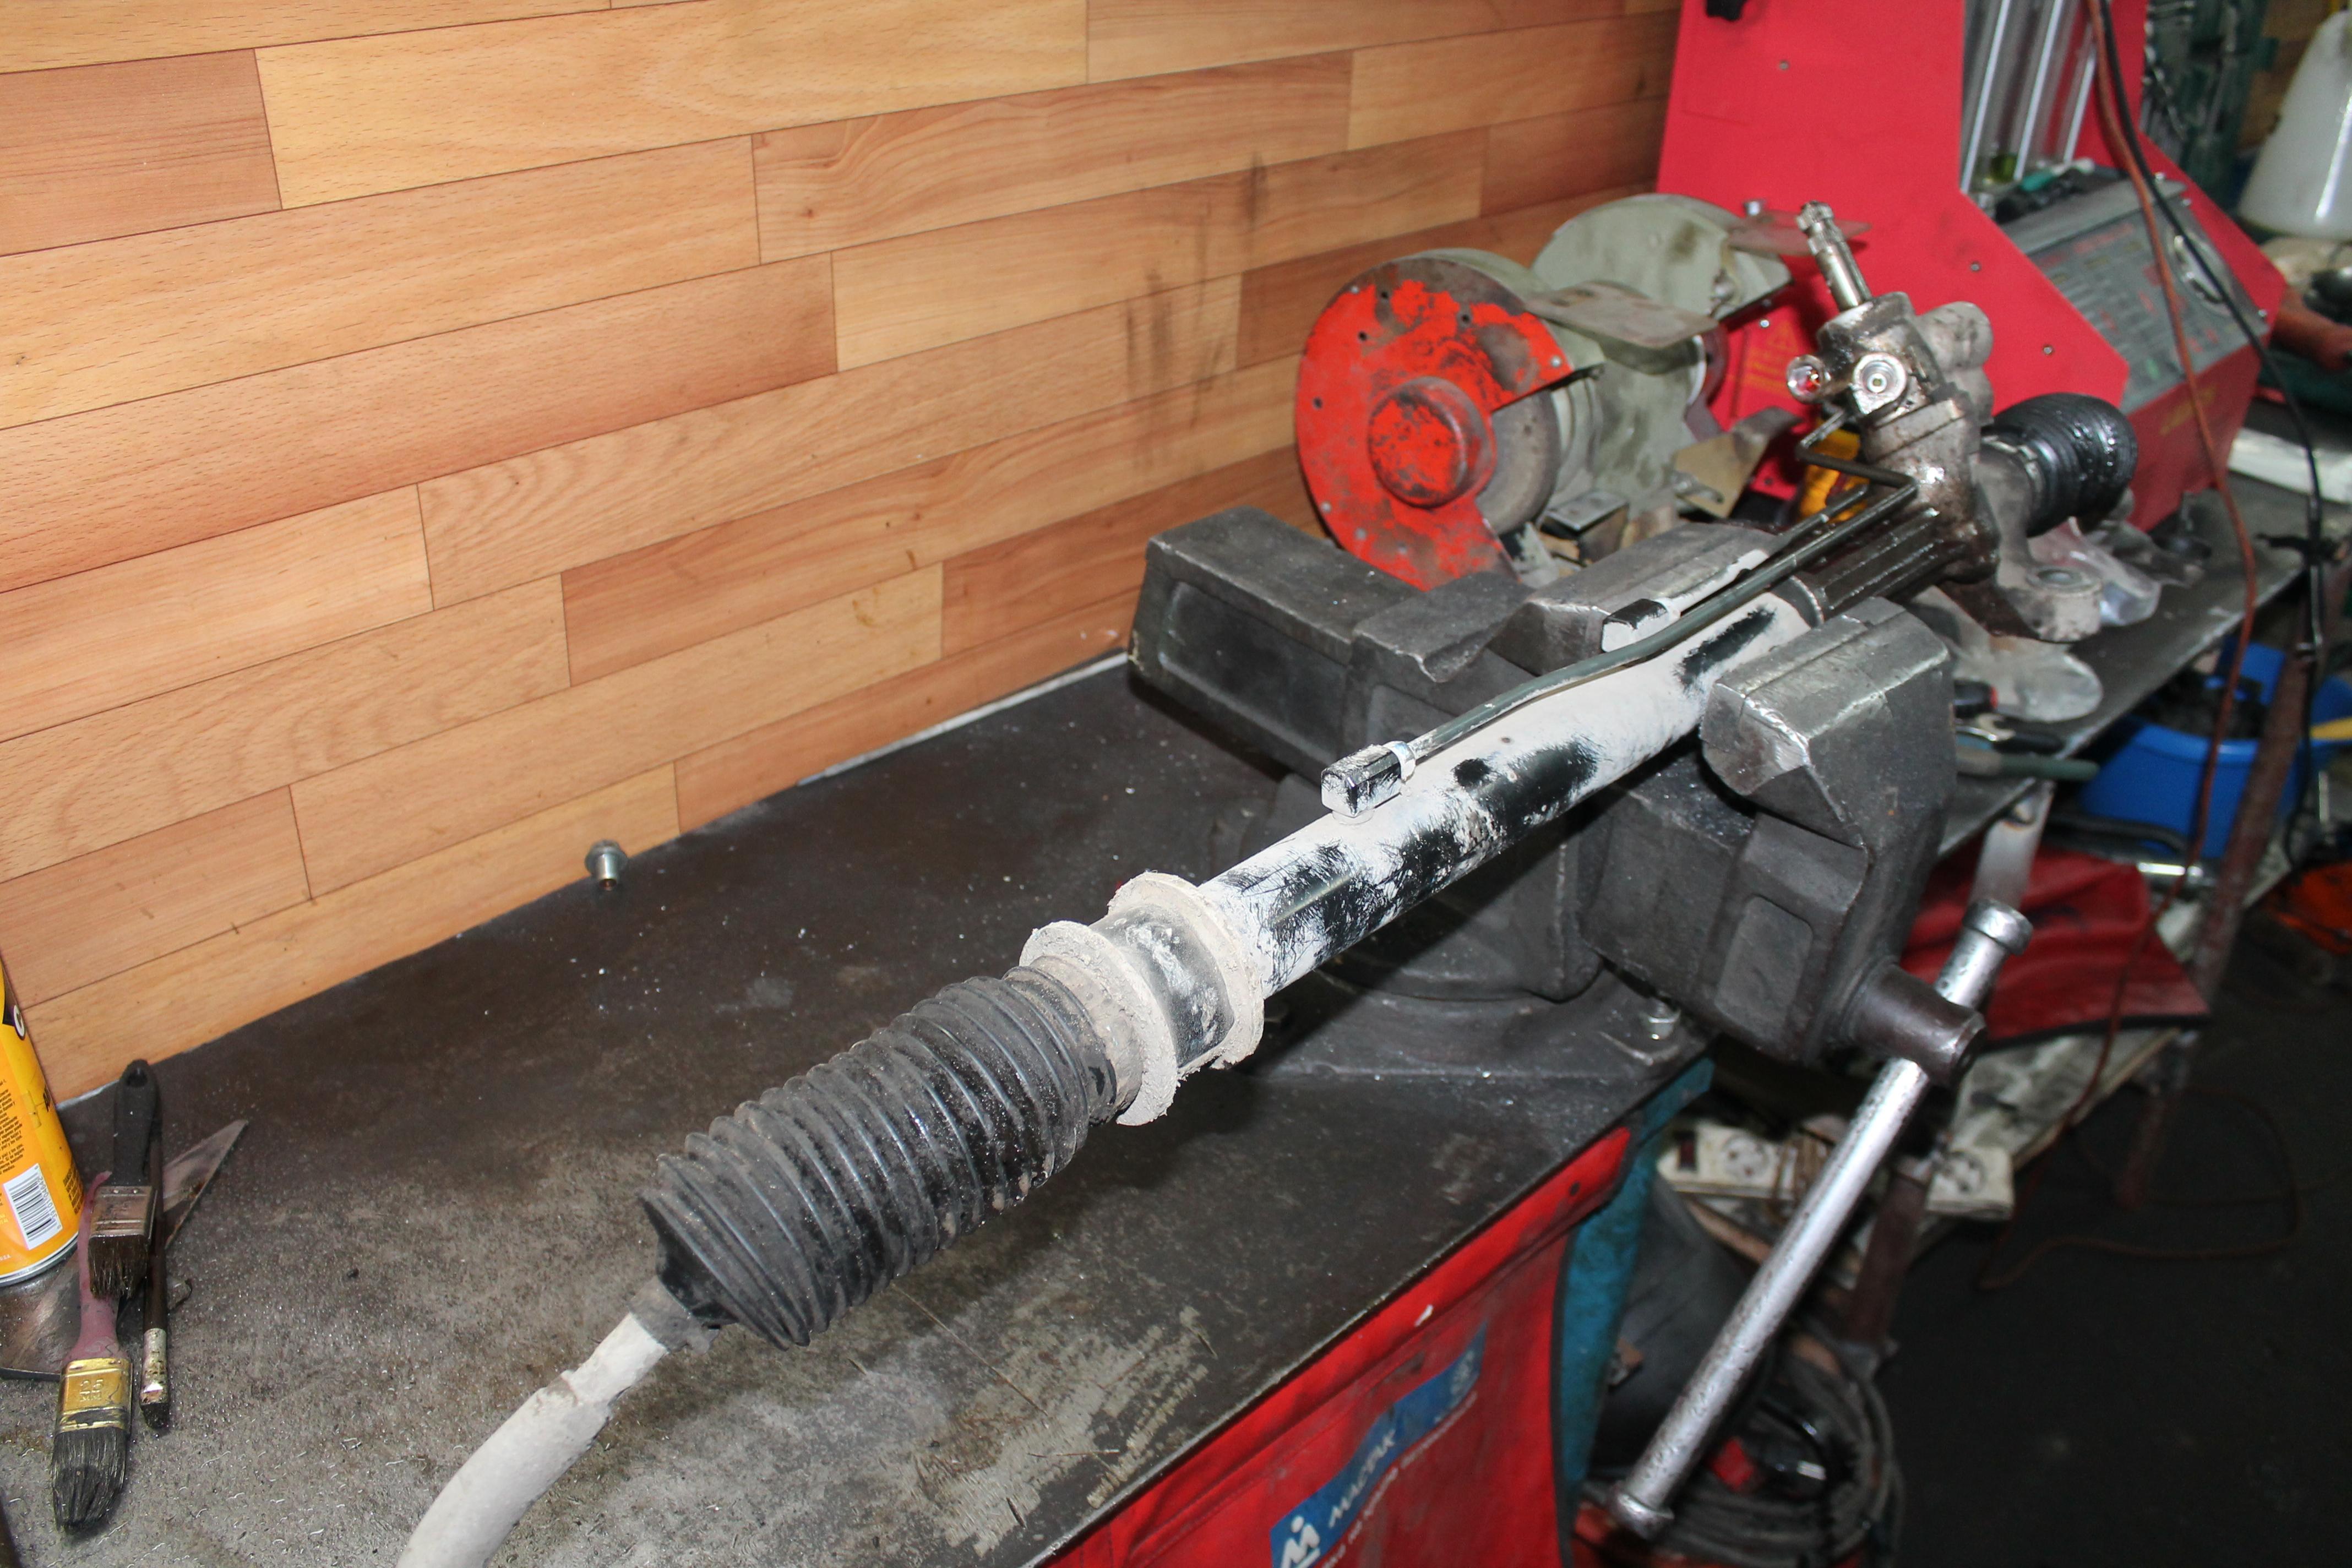 Замена рулевой рейки на ВАЗ 2110 своими руками: инструкция по 13